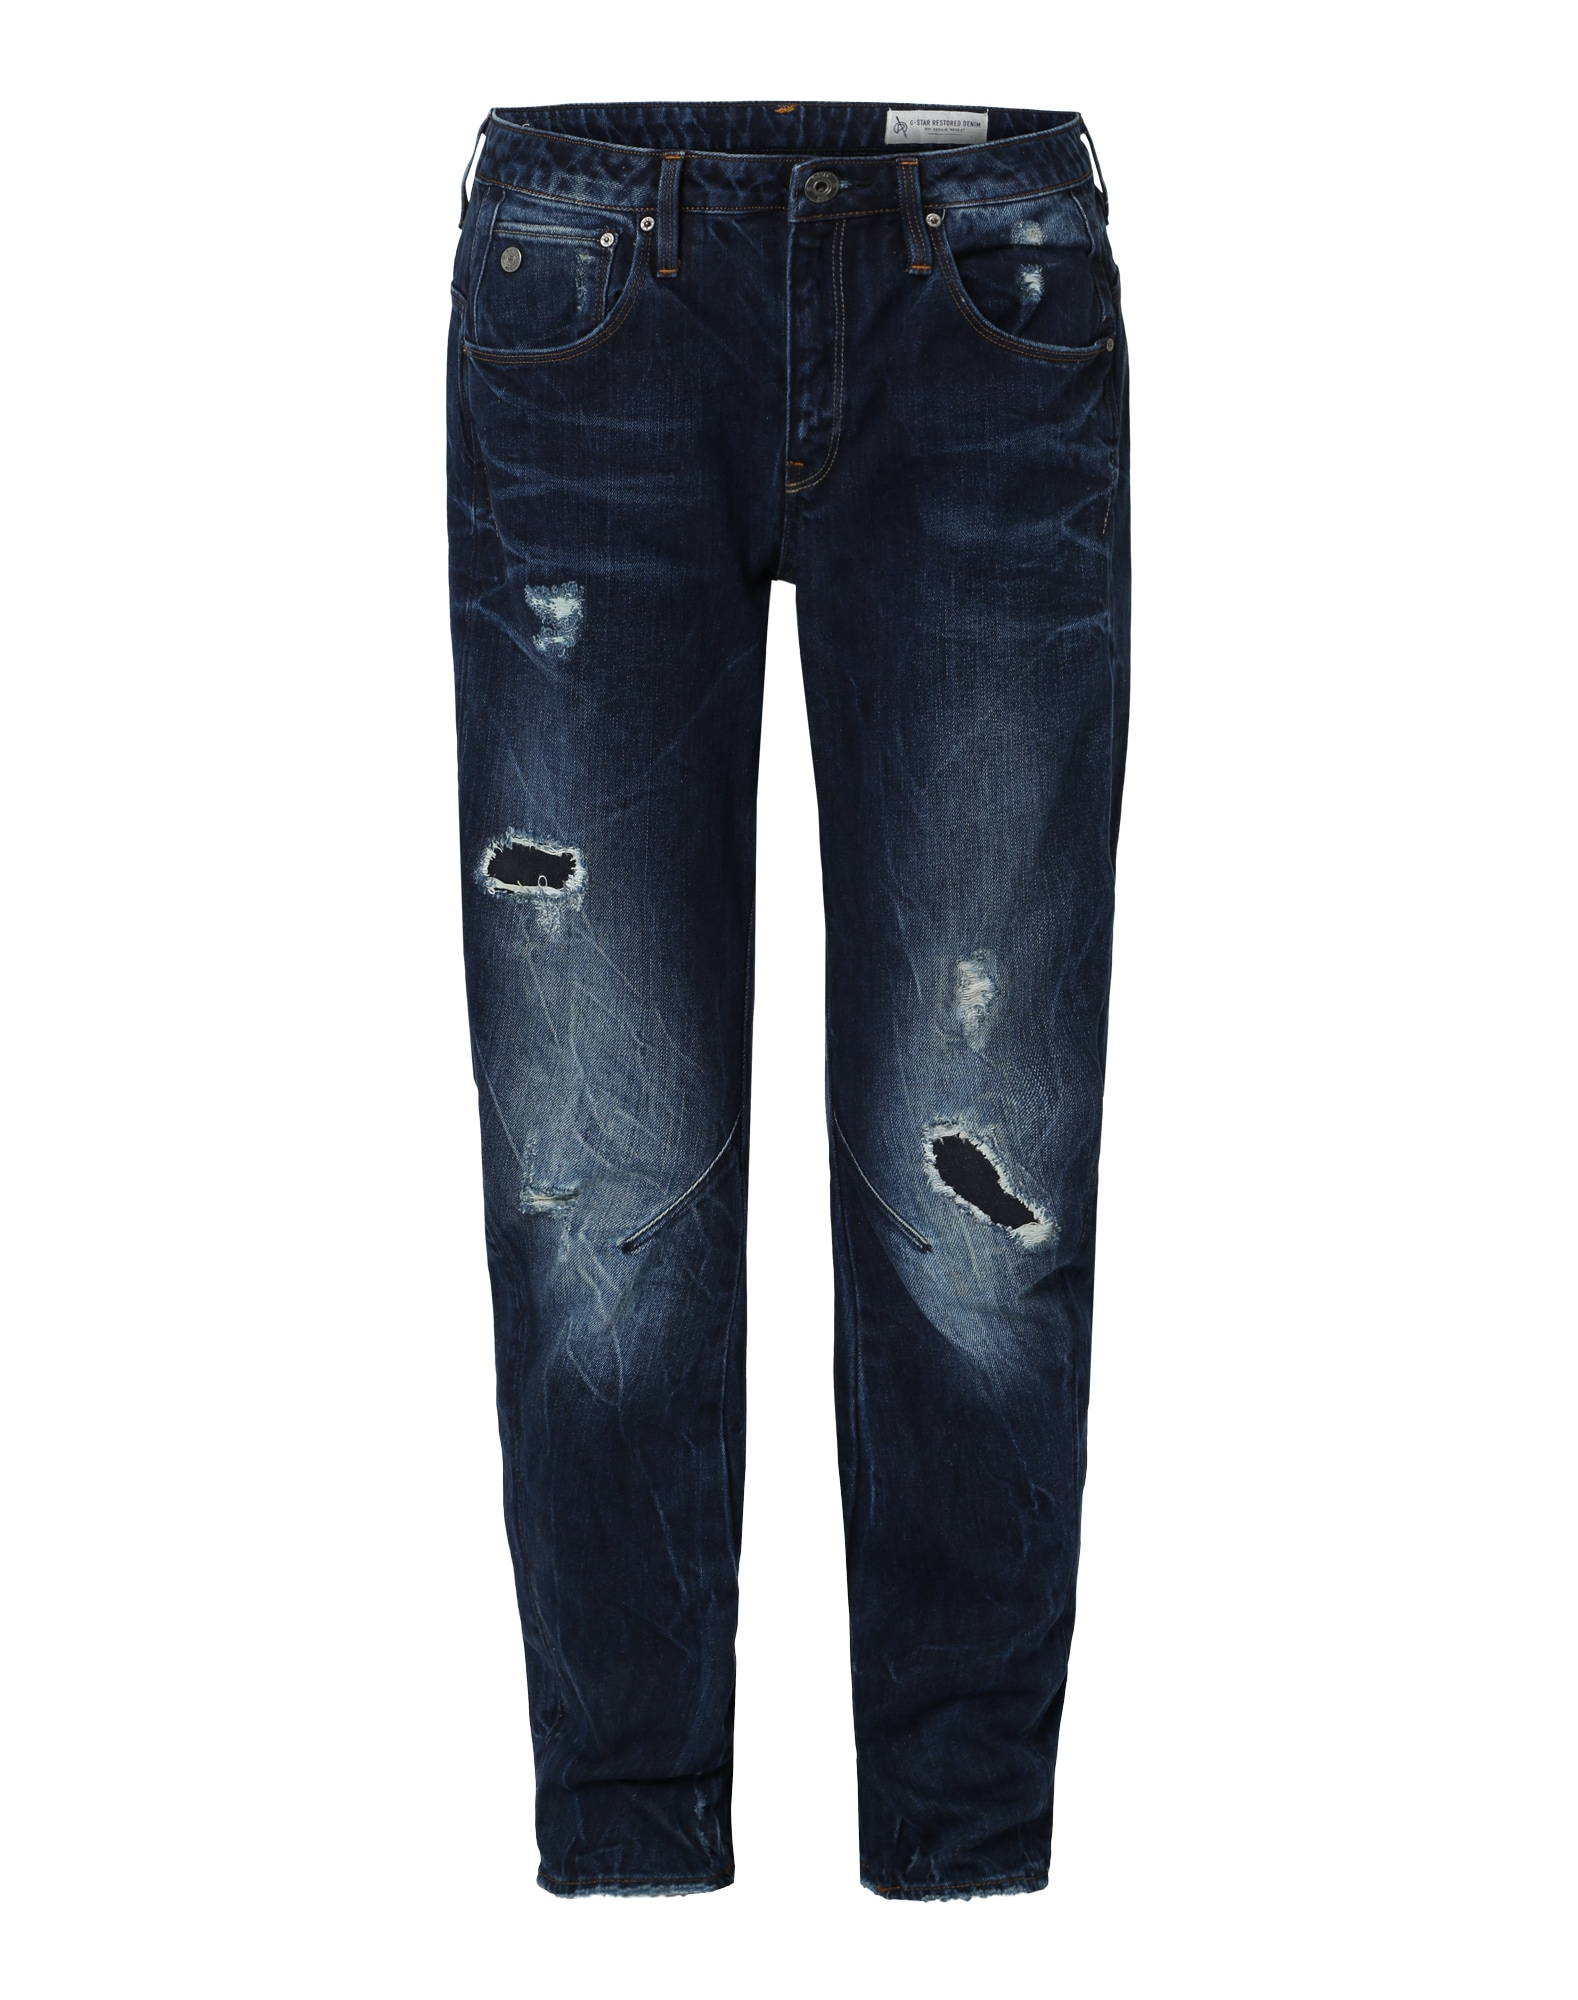 G-STAR RAW Dames Jeans arc 3d donkerblauw